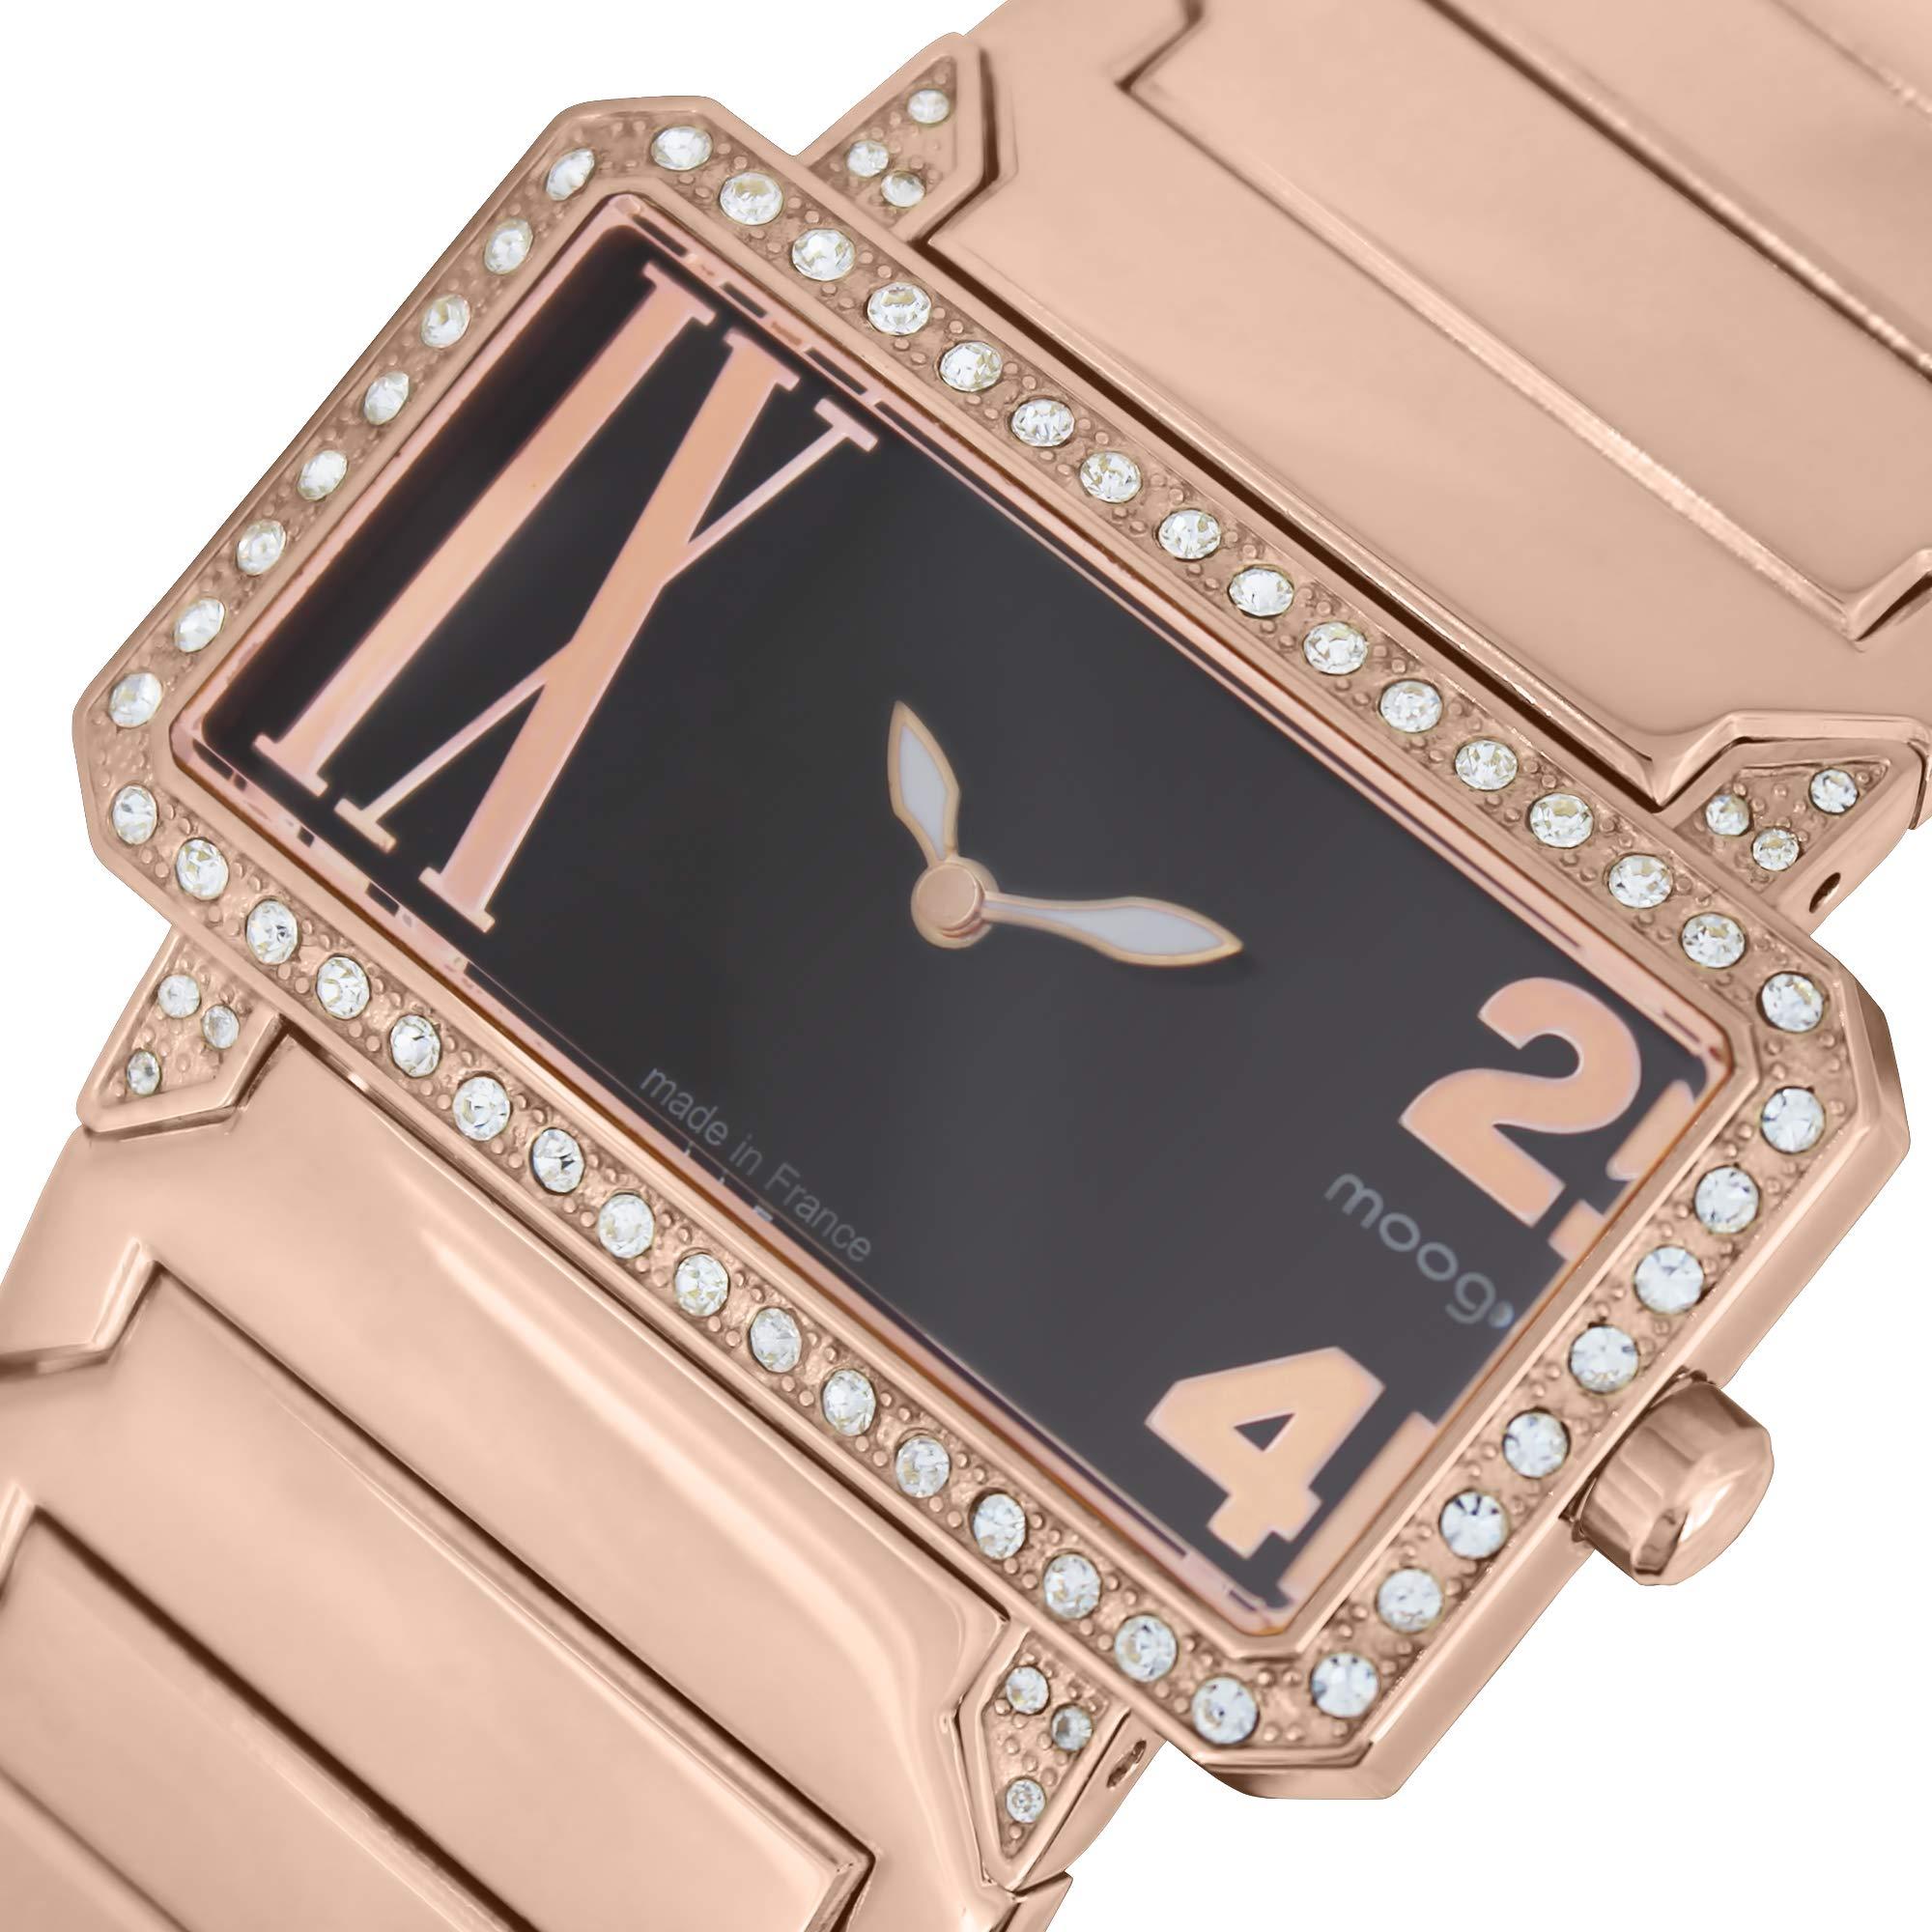 Moog-Paris-Damen-Uhr-Analog-mit-Edelstahl-Armband-M44874-005